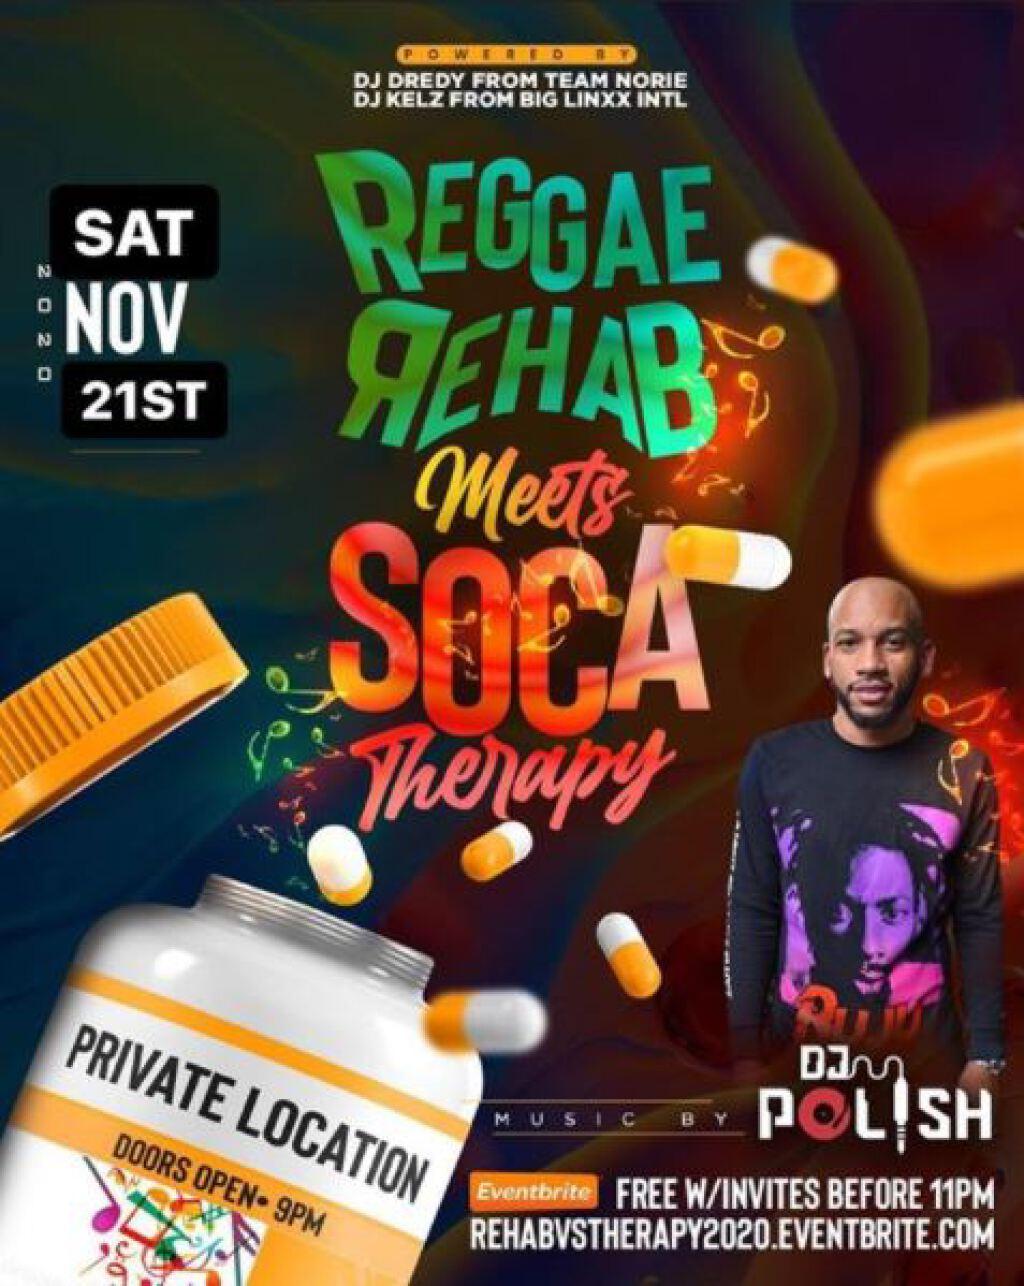 Reggae Rehab Vs Soca Therapy flyer or graphic.